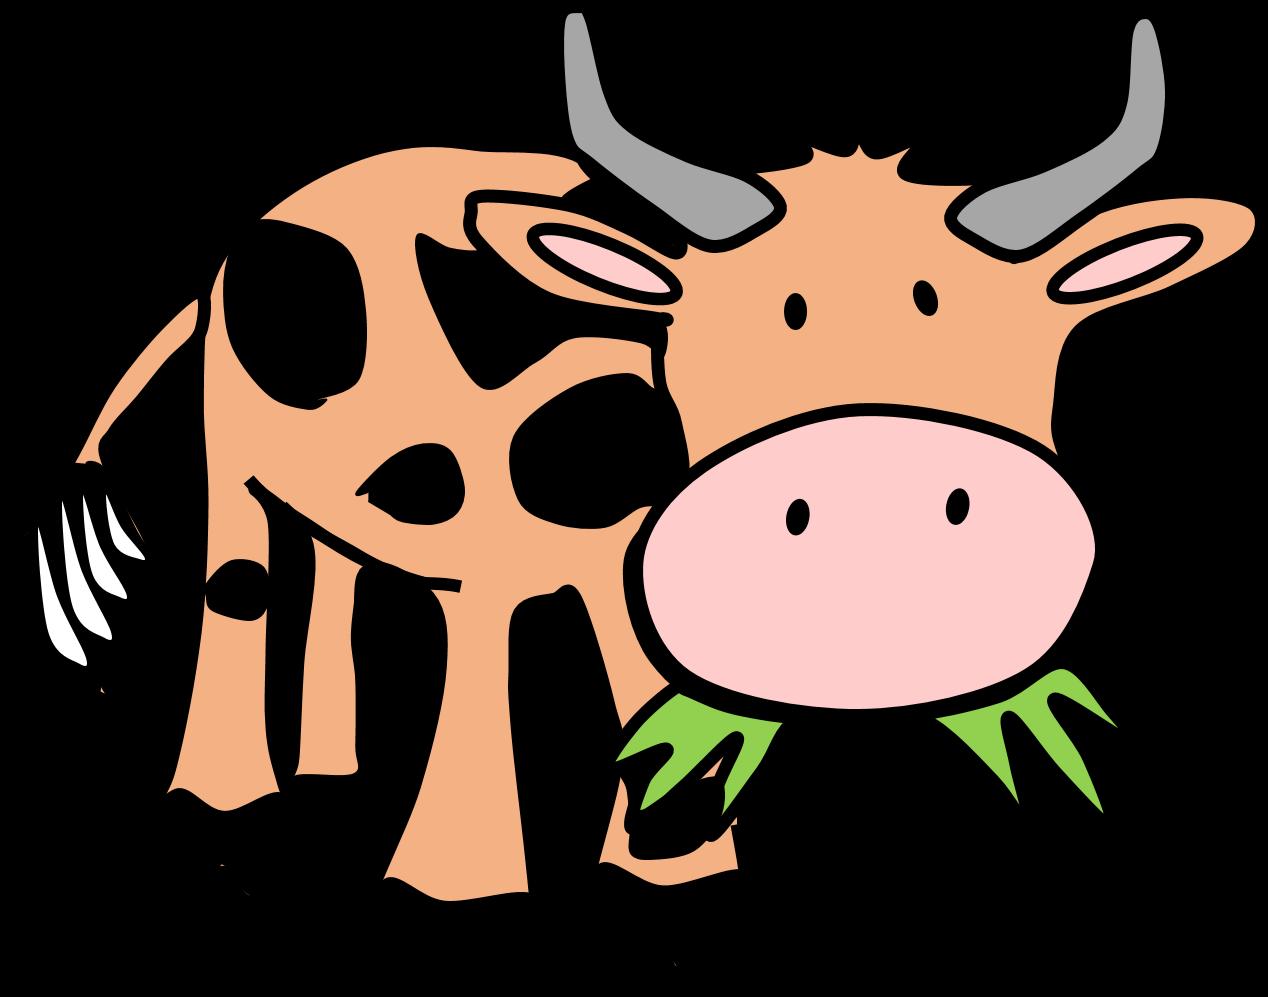 free farm animals clipart | Animales prediseñados ...Clip Art Pictures Of Farm Animals